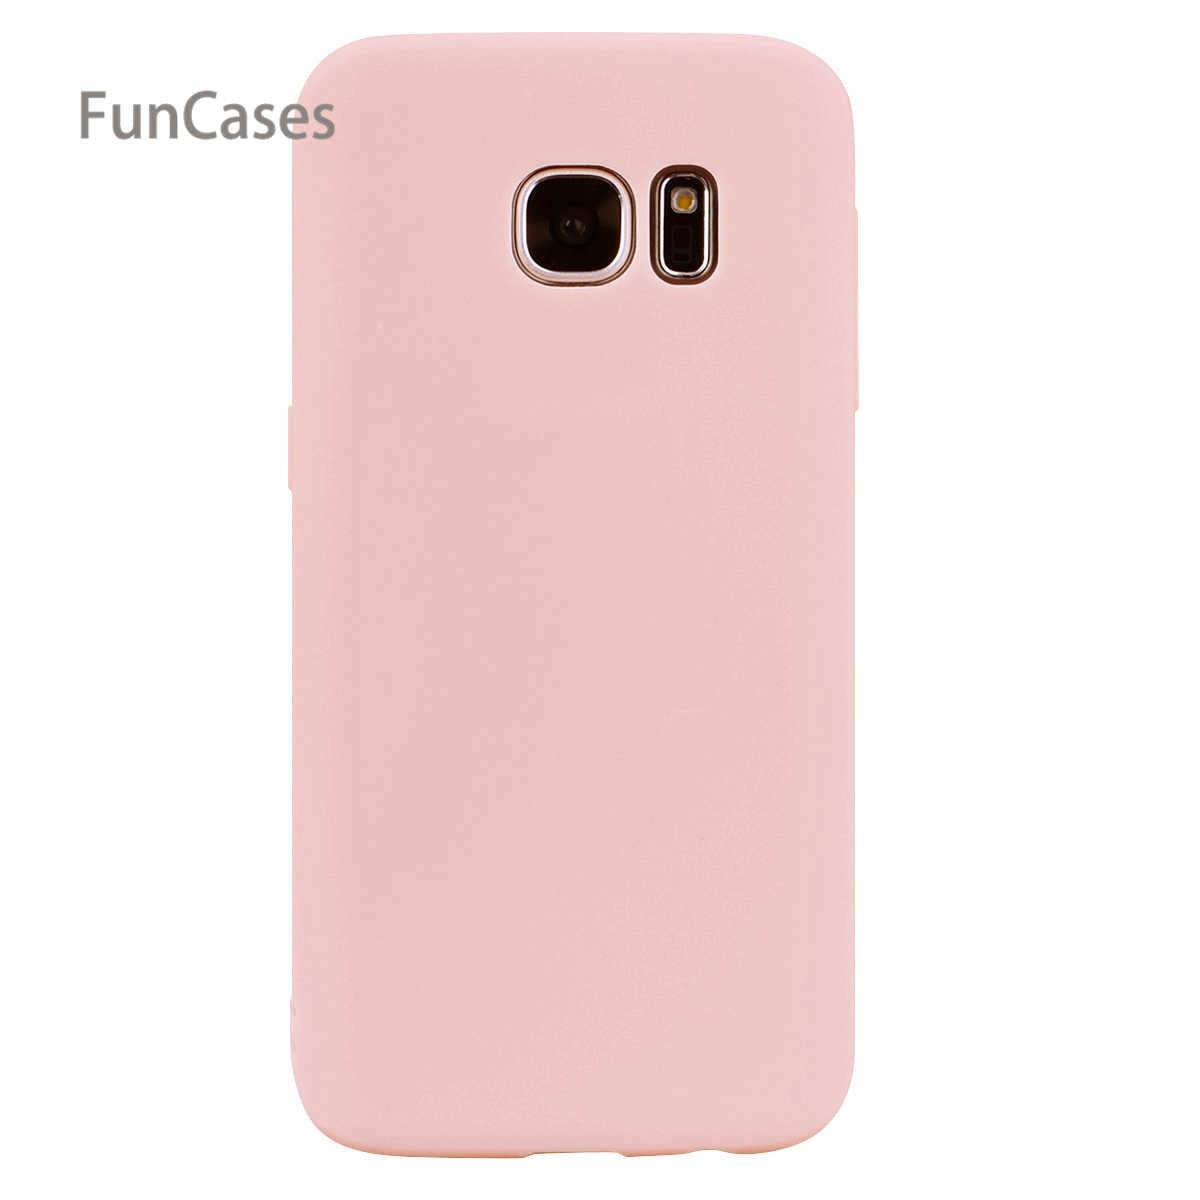 Slim Kasus Capinha sFor Samsung S7 Tepi Lembut TPU Kembali Penutup portabel Lucu Silikon Kasus sFor Samsung Galaxy S7 Tepi Telepon Pouch